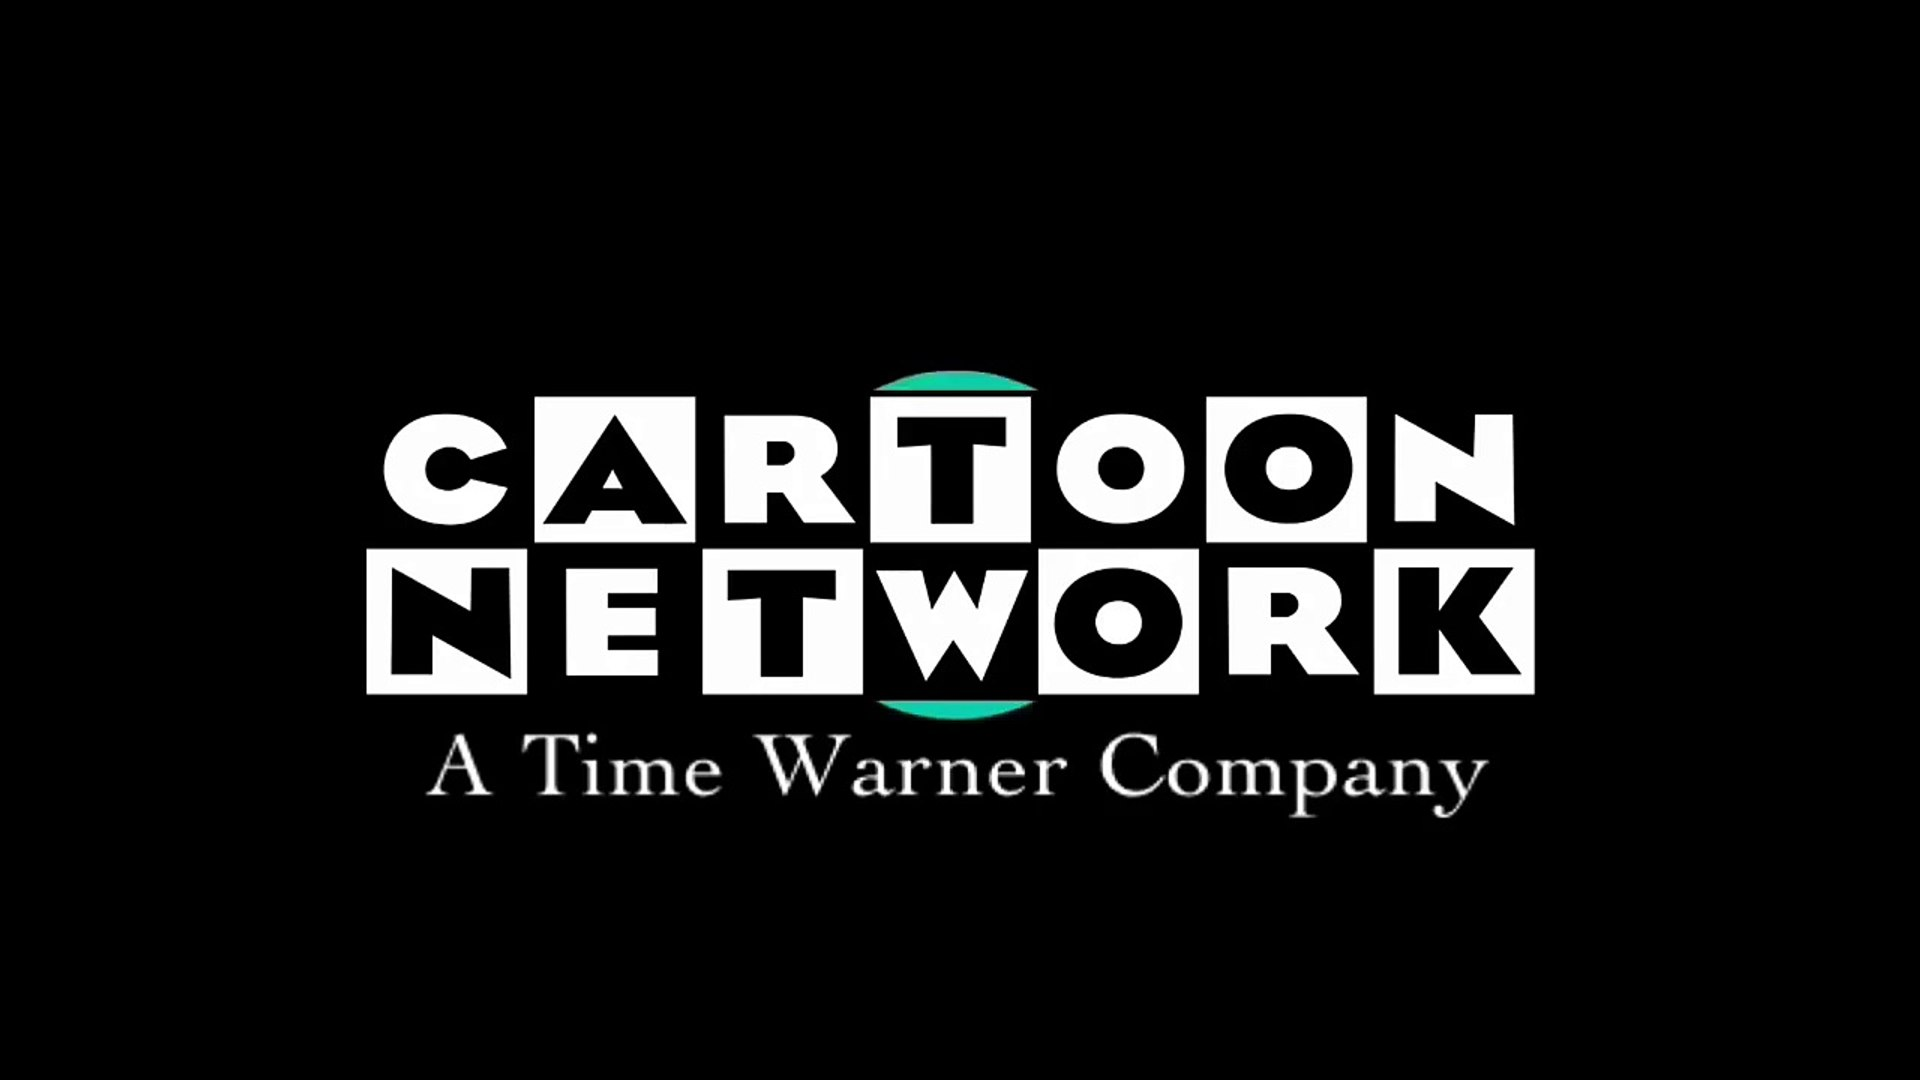 Cartoon Network Logo Remake 1999 2001 Present Video Dailymotion